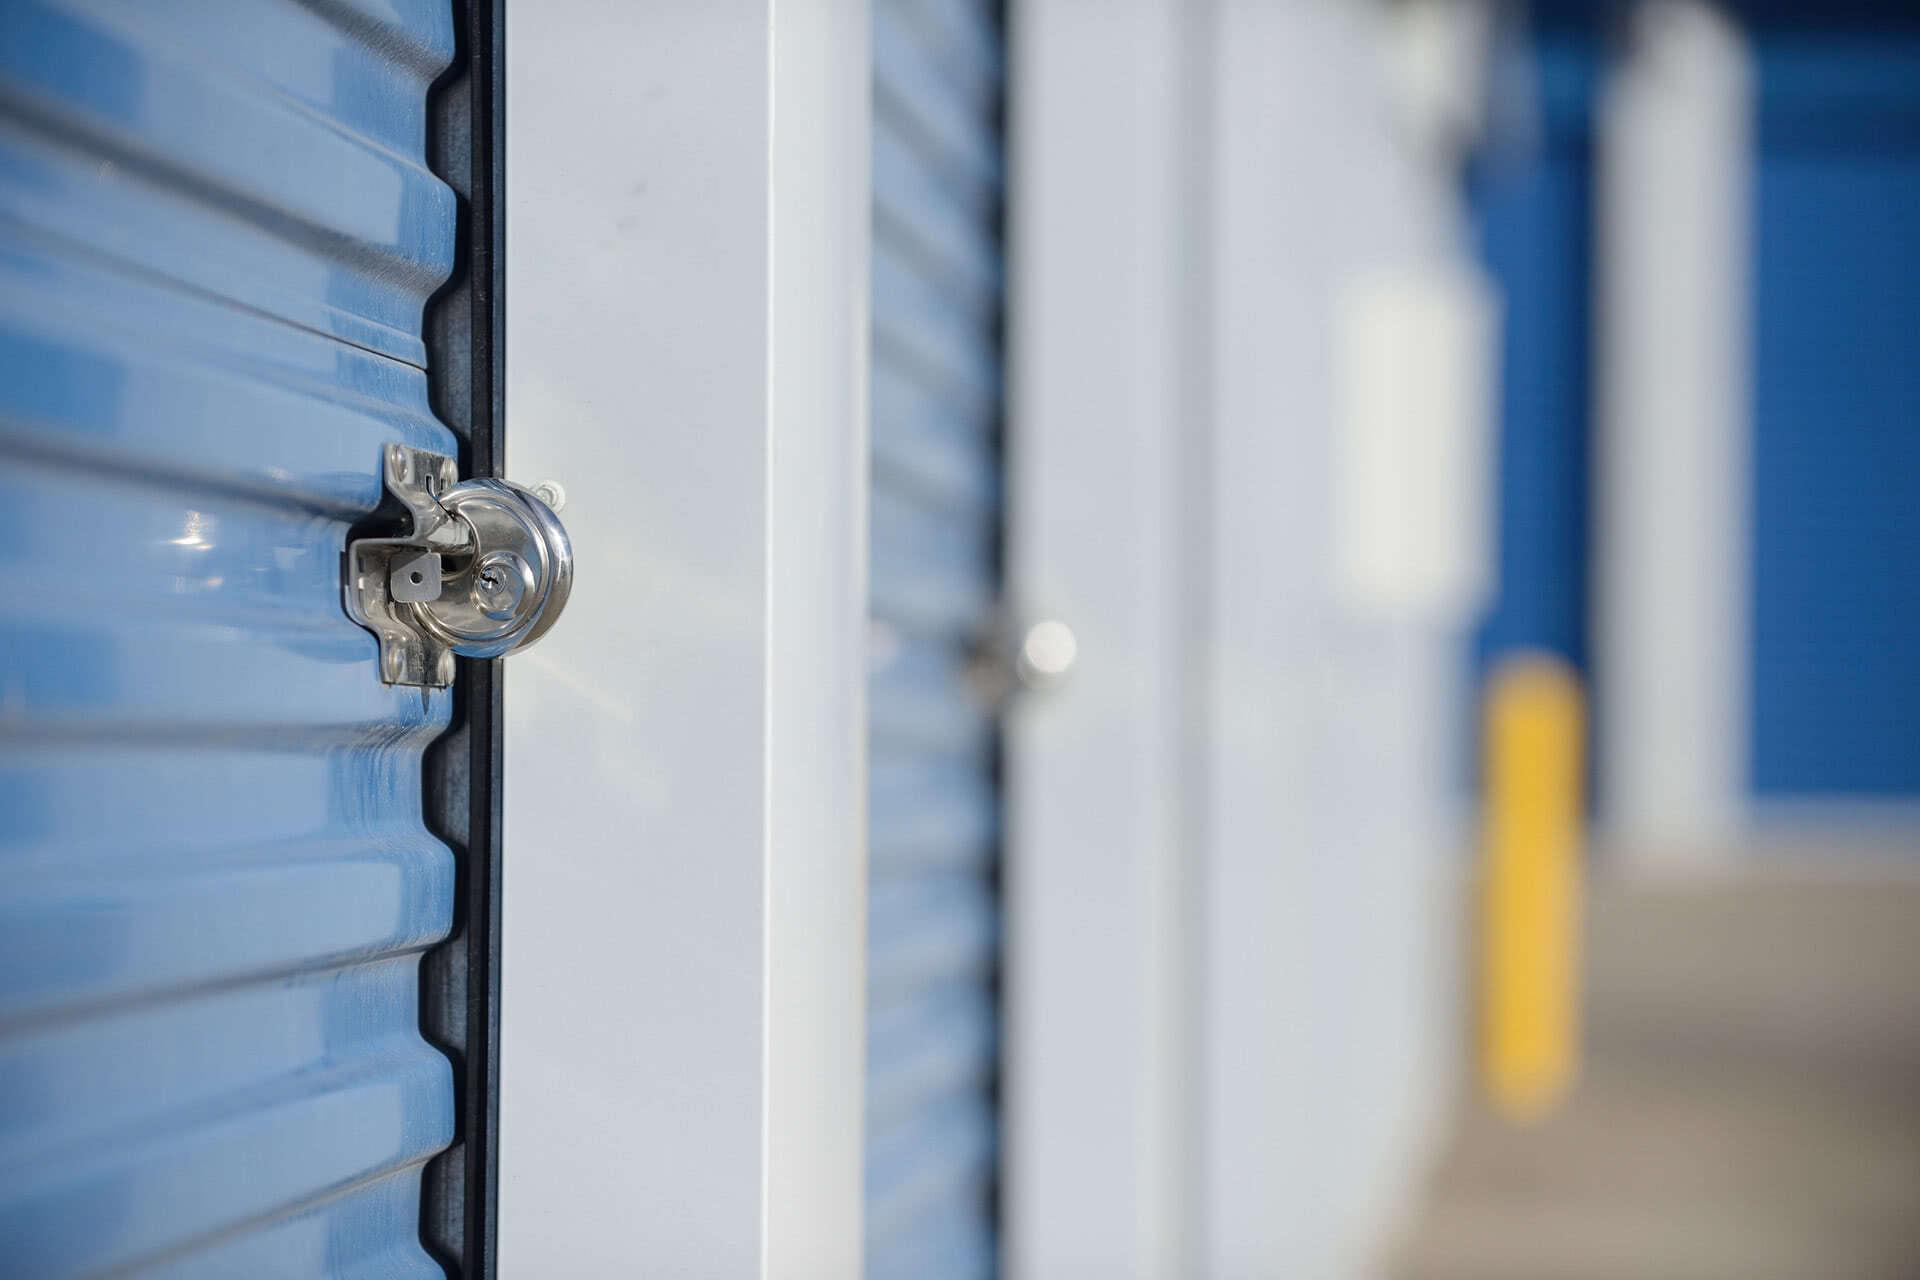 Closeup of blue self storage locker